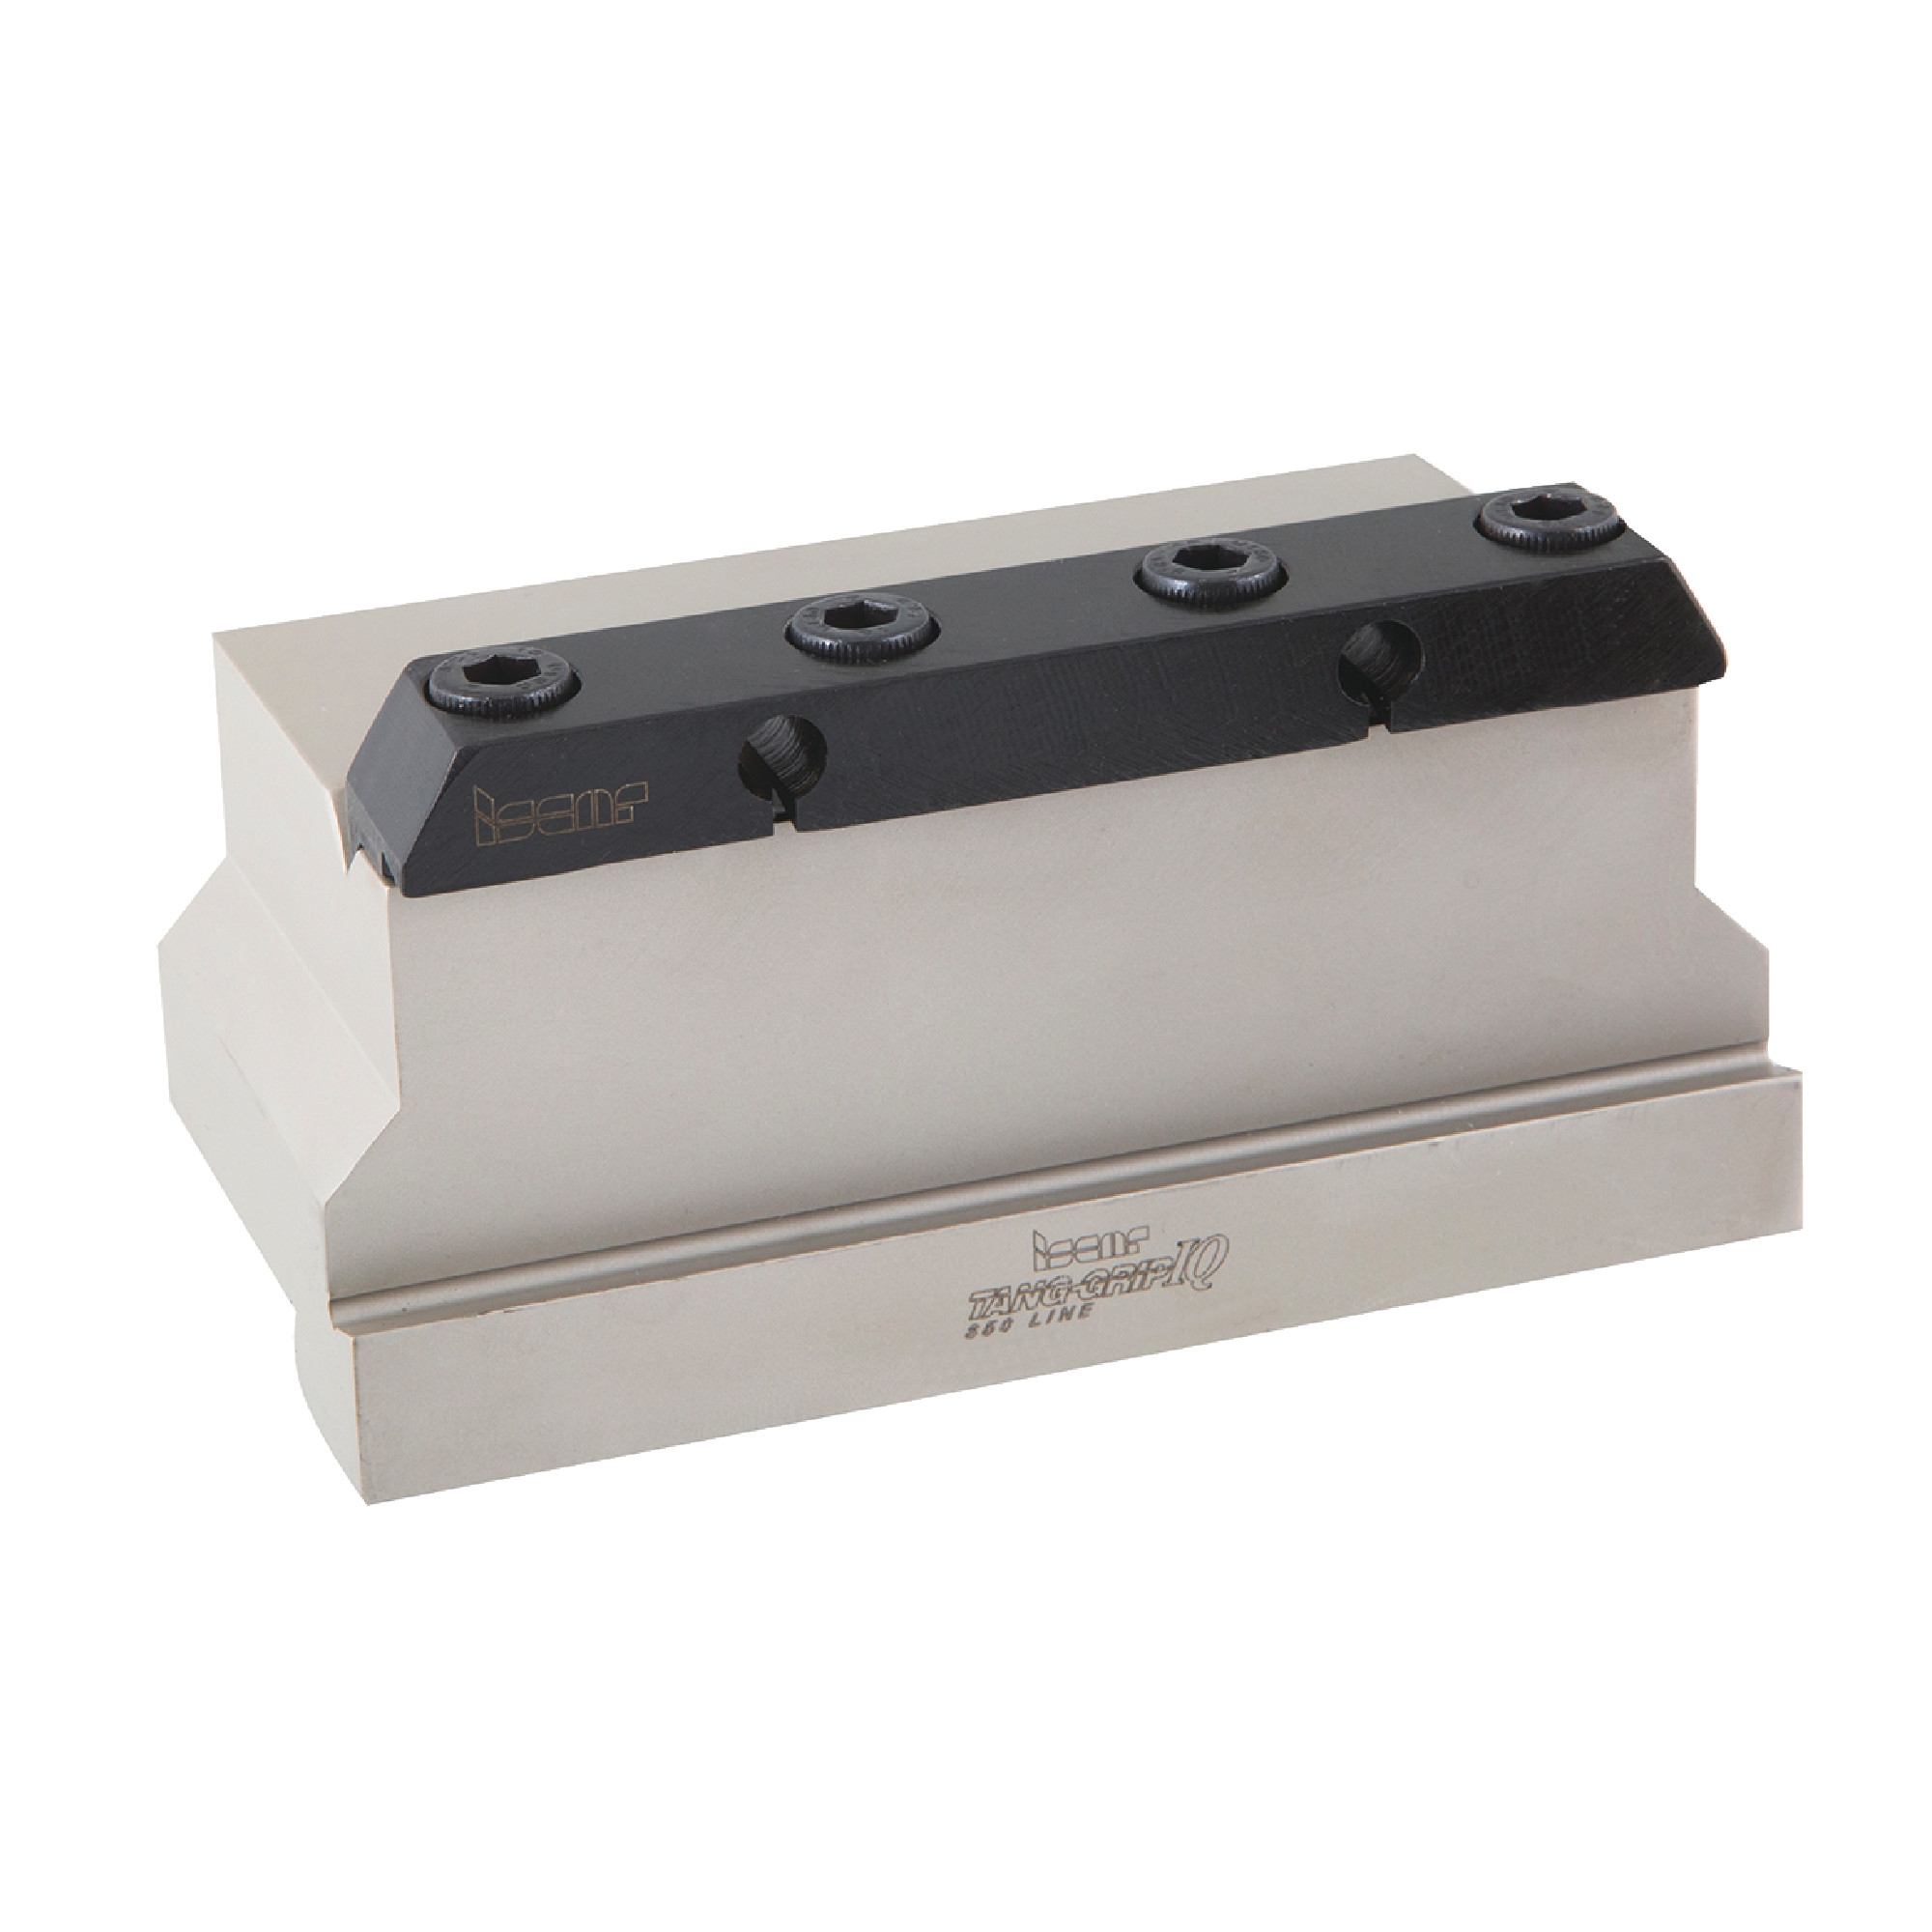 "ISCAR - TGTBU 19-35 Blade Block / 0.750"" X 0.750"" Shank / For 1.378"" (35mm) Height Blades"